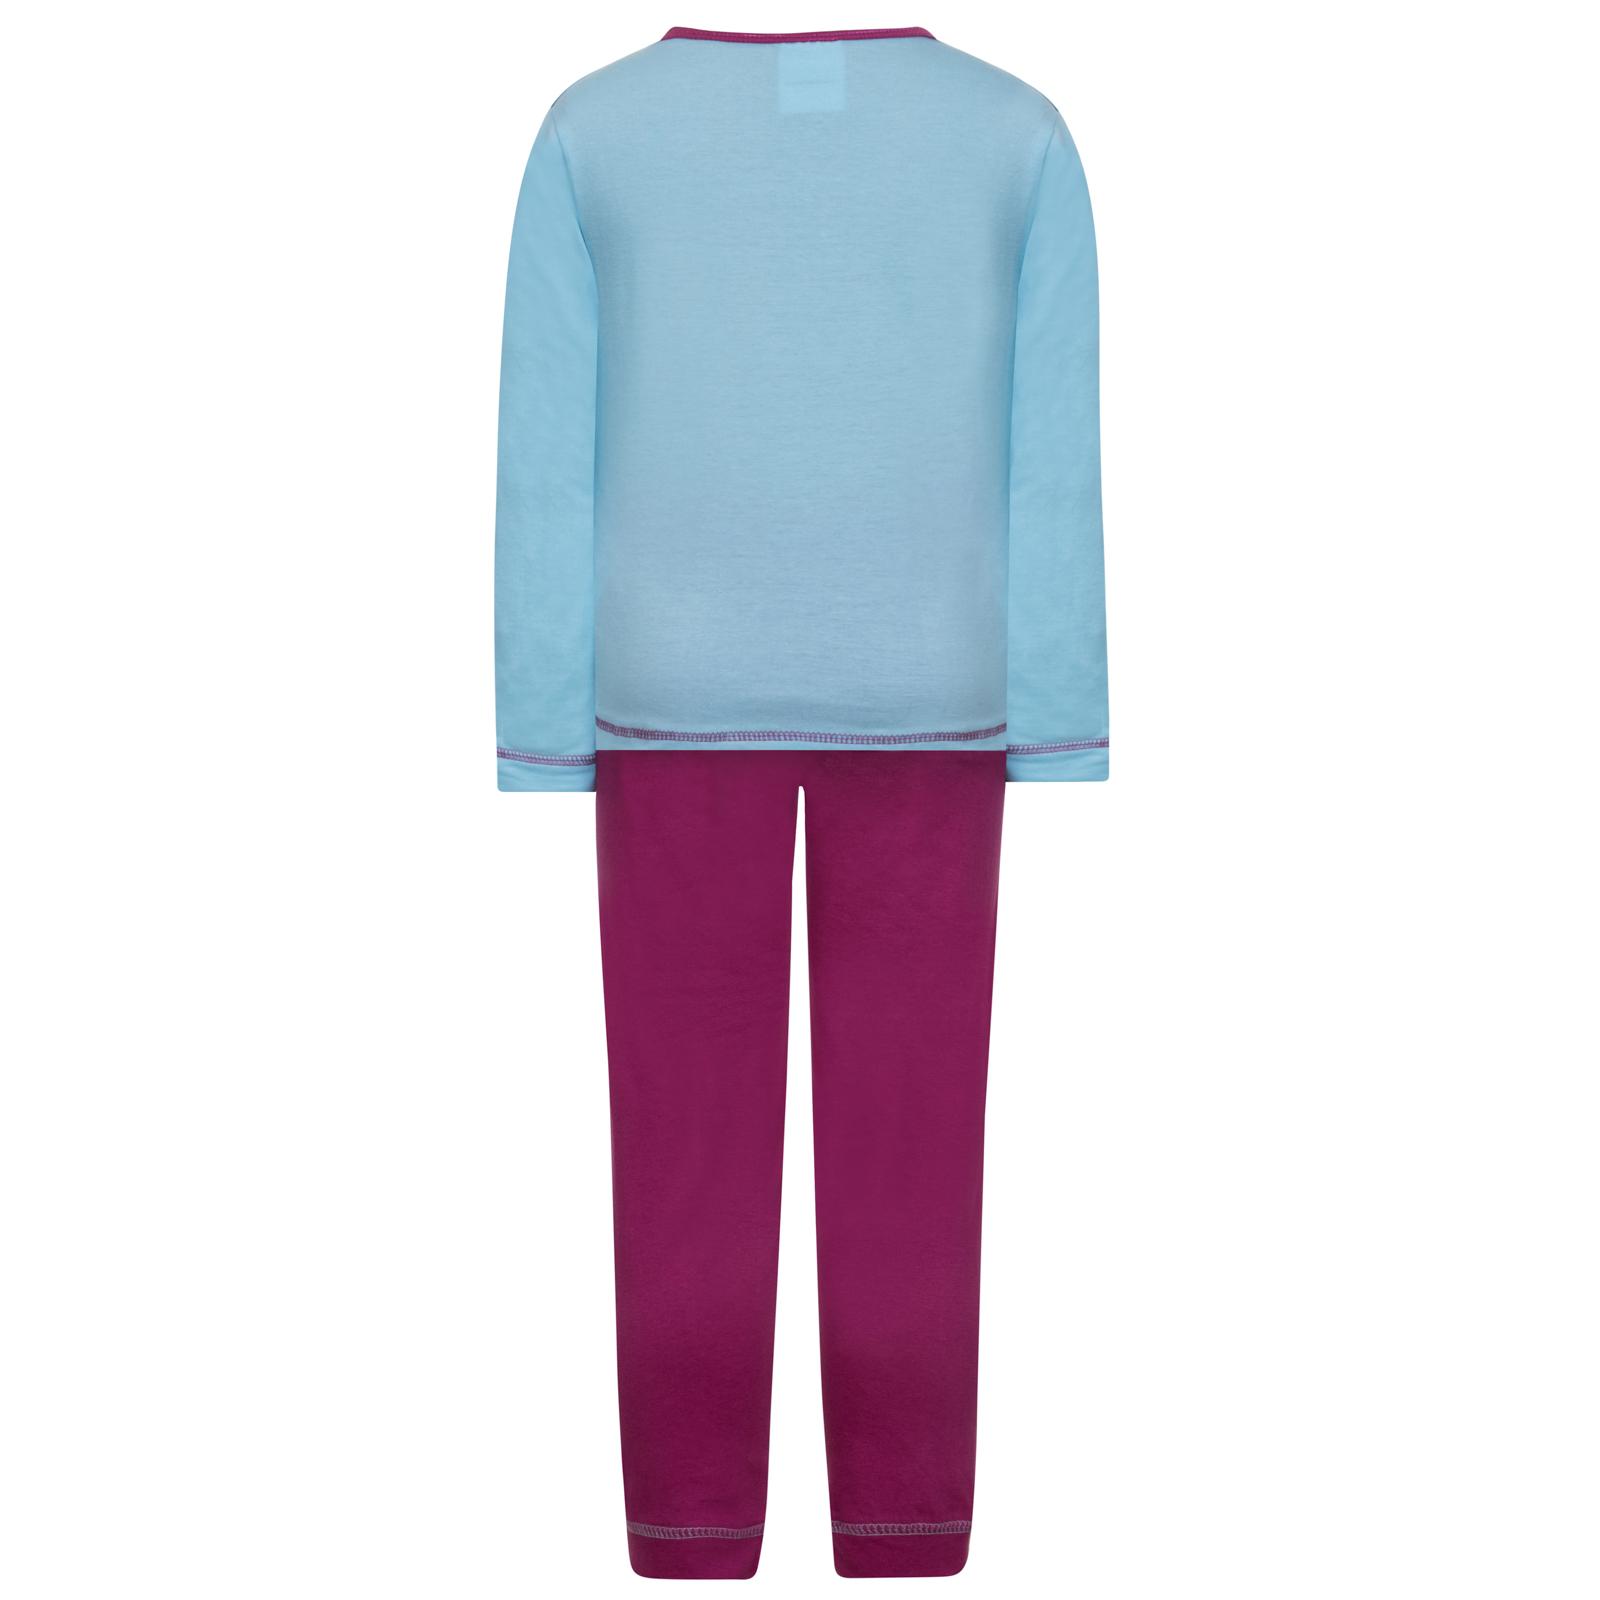 Shimmer And Shine Official Gift Toddler Girls Kids Pyjamas